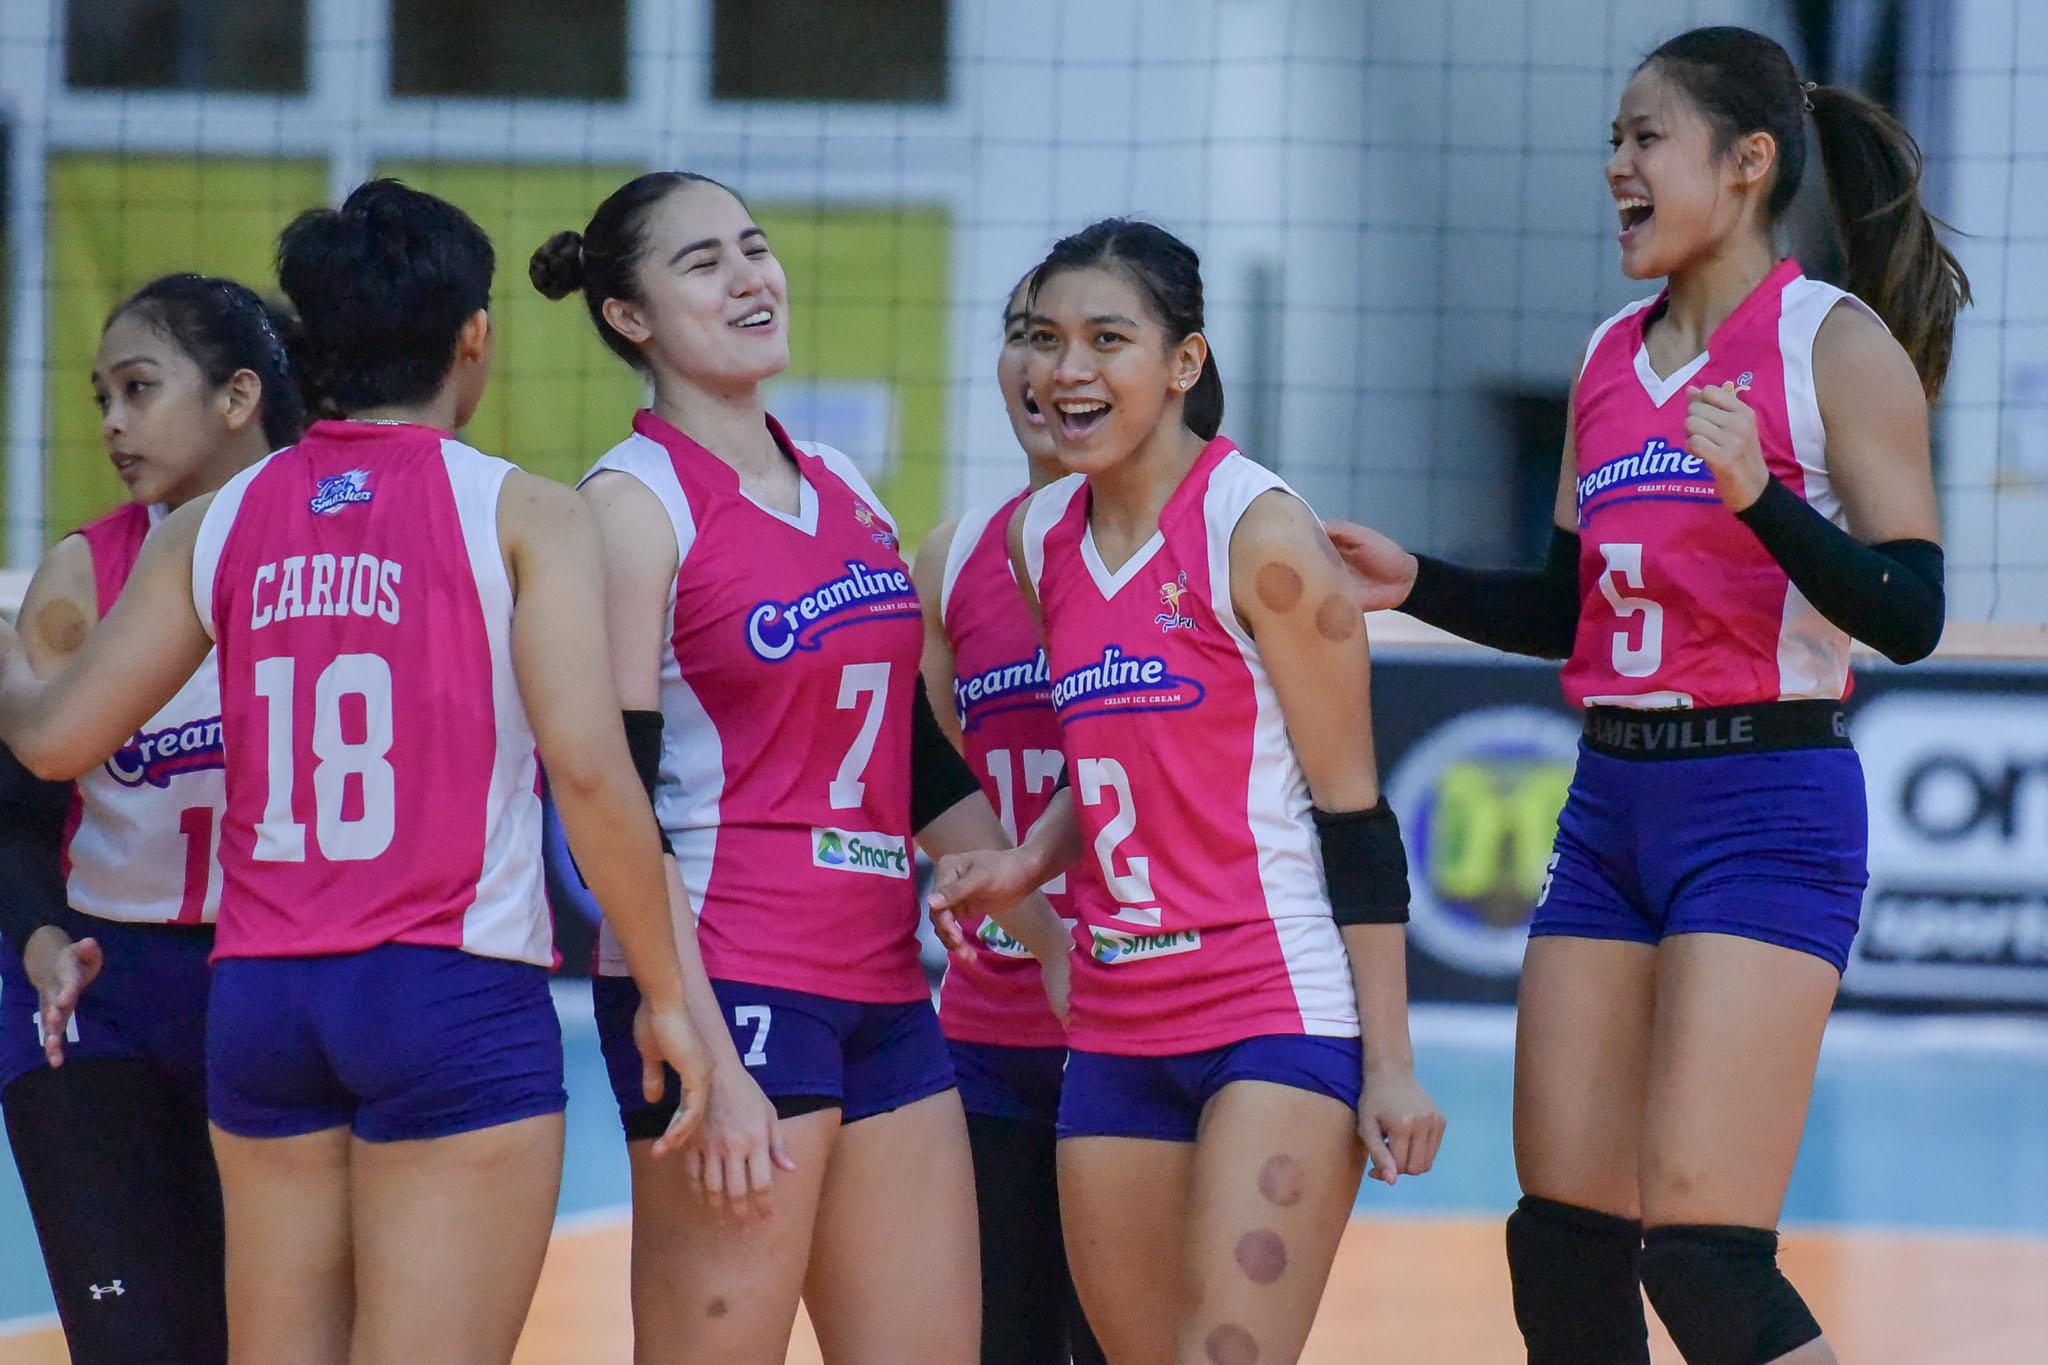 2021-PVL-Open-Creamline-vs.-Choco-Mucho-Michele-Gumabao-Alyssa-Valdez-7777 Almadro says Choco Mucho lacked 'maturity' in Creamline loss News PVL Volleyball  - philippine sports news